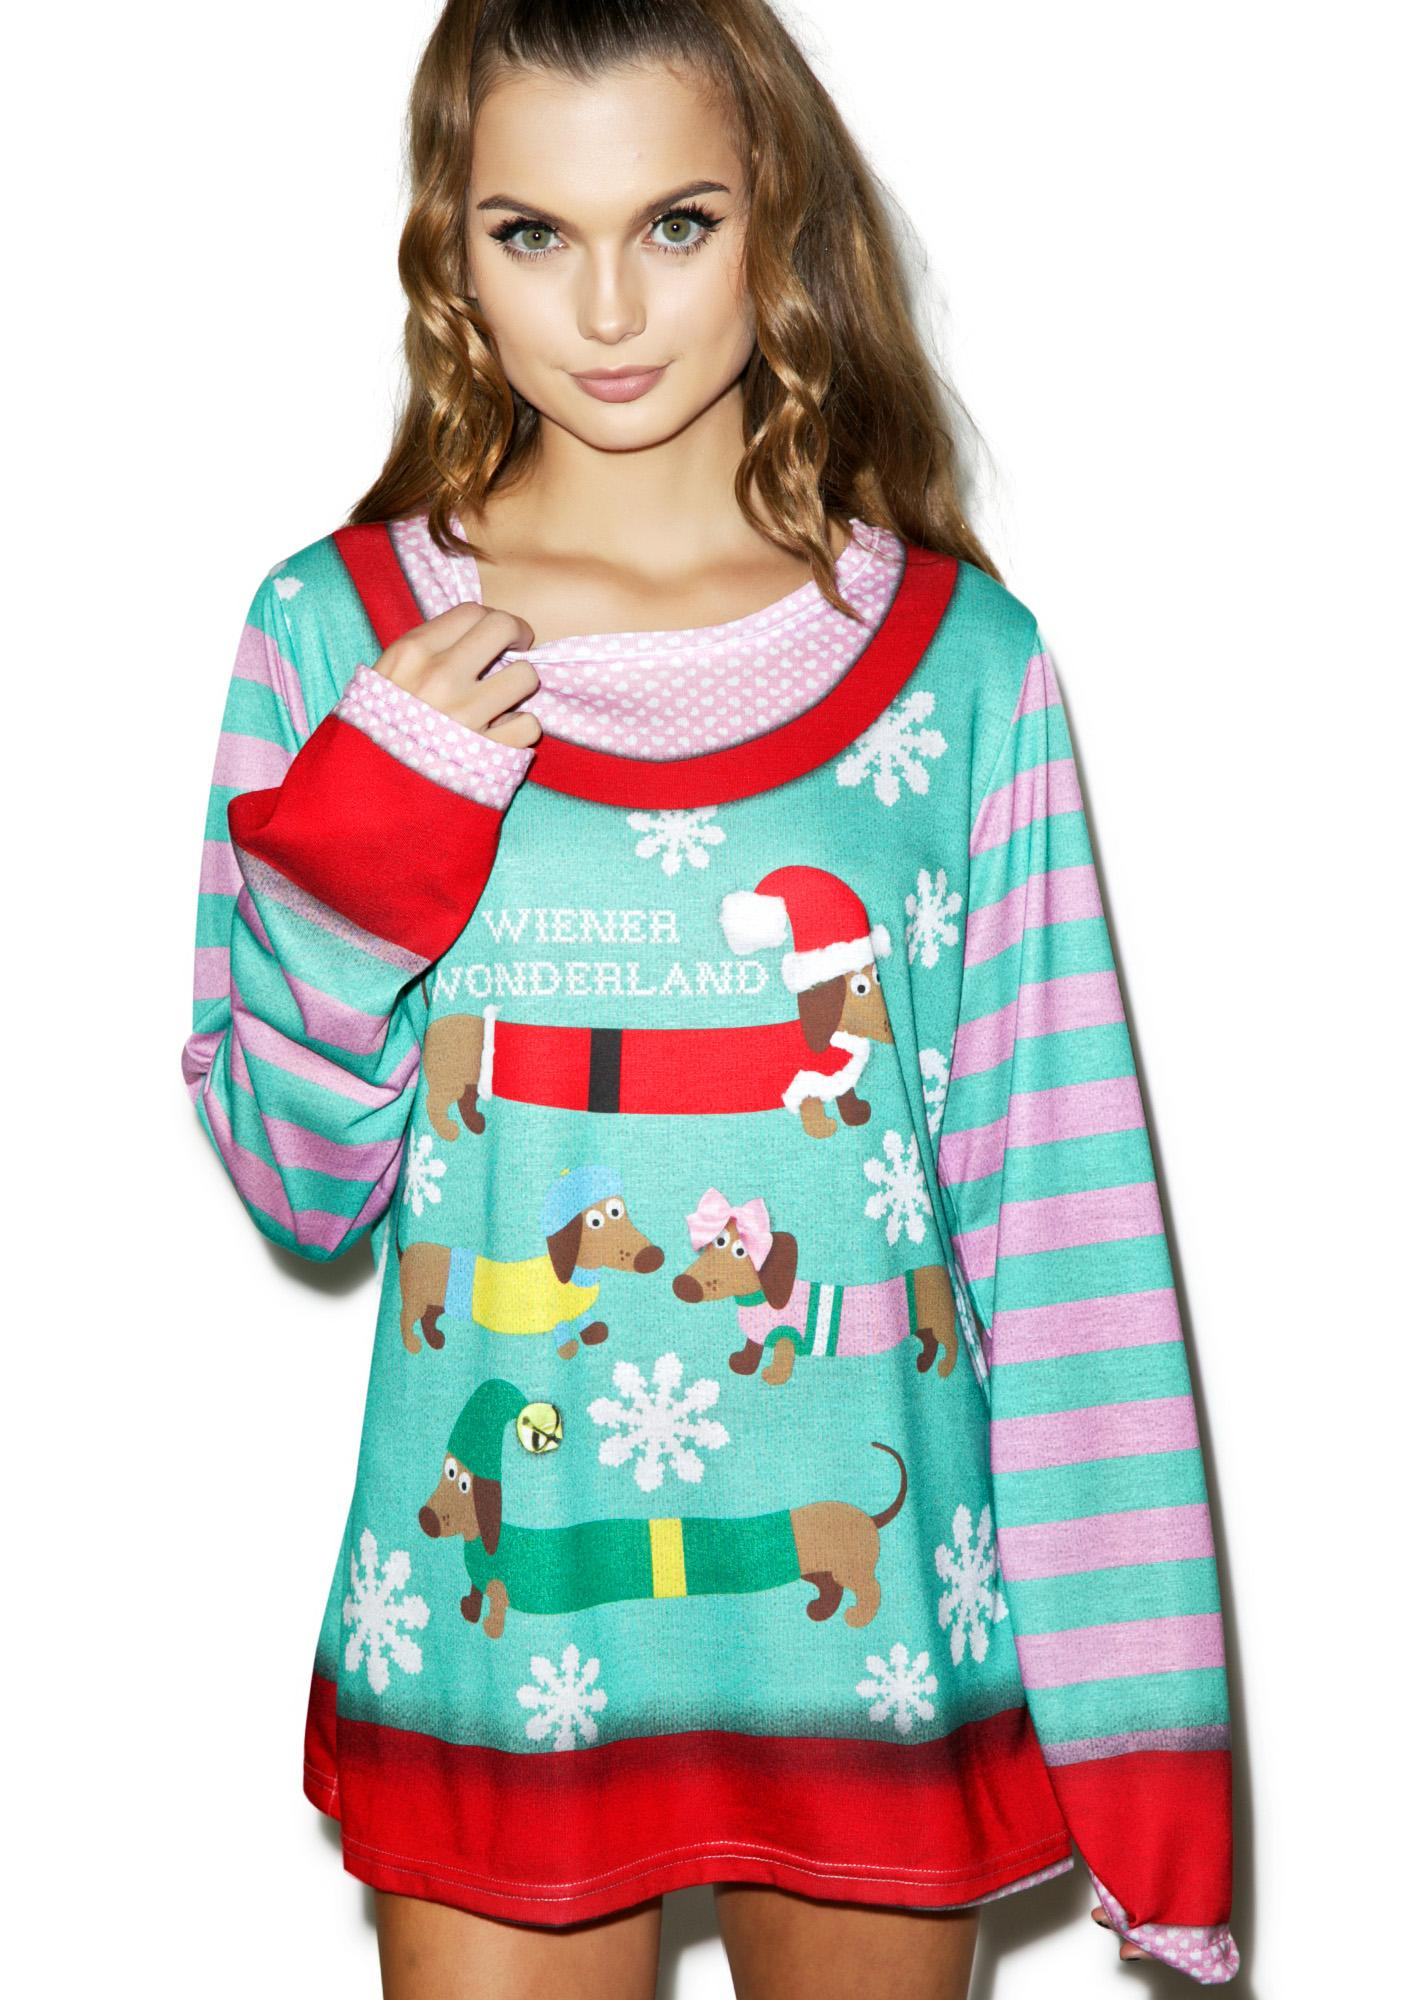 Wiener Wonderland Sweater Tee